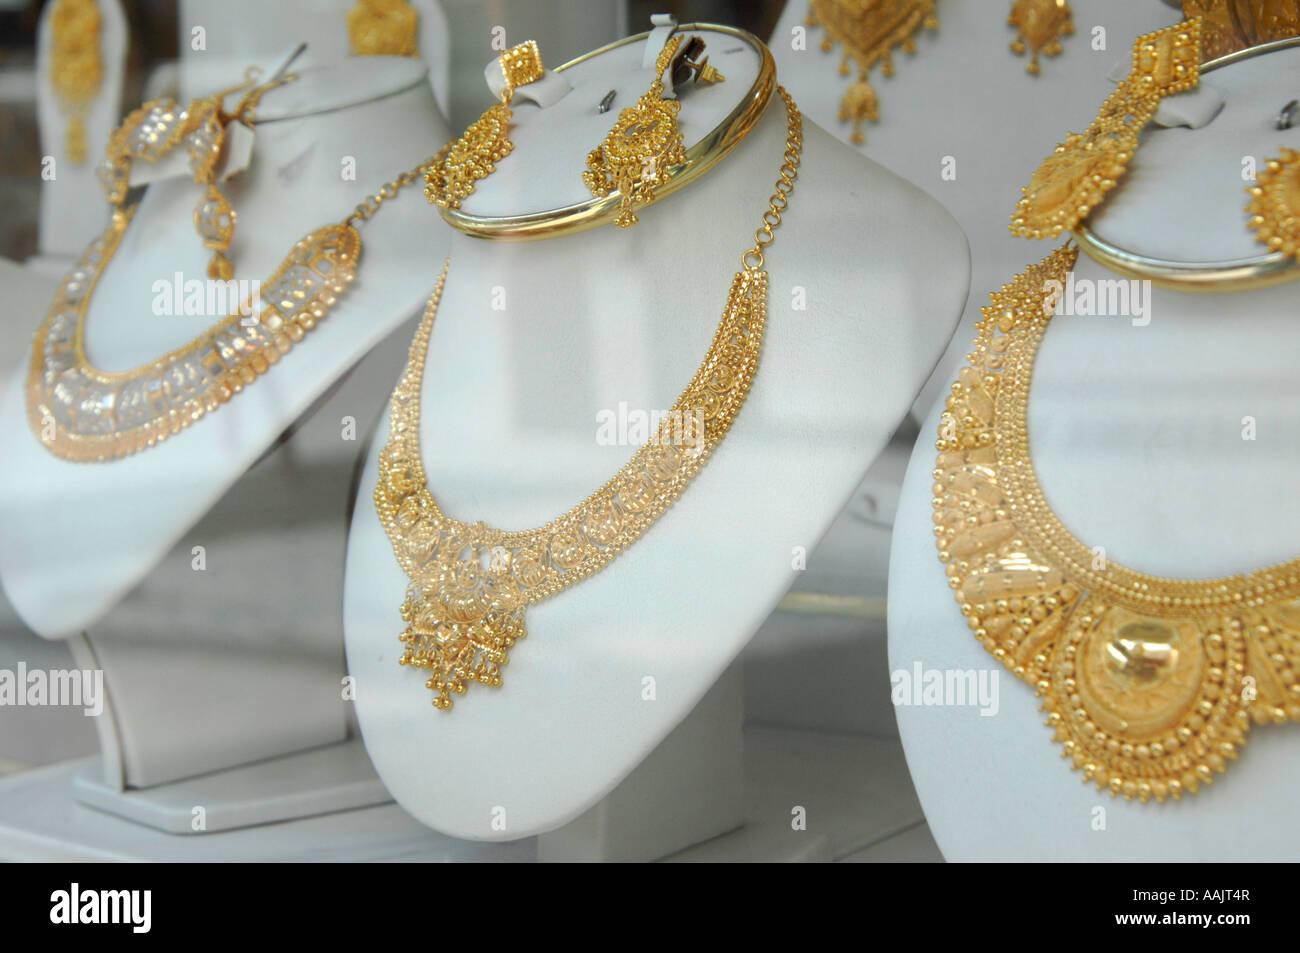 Gold jewellery at souk in Dubai - Stock Image